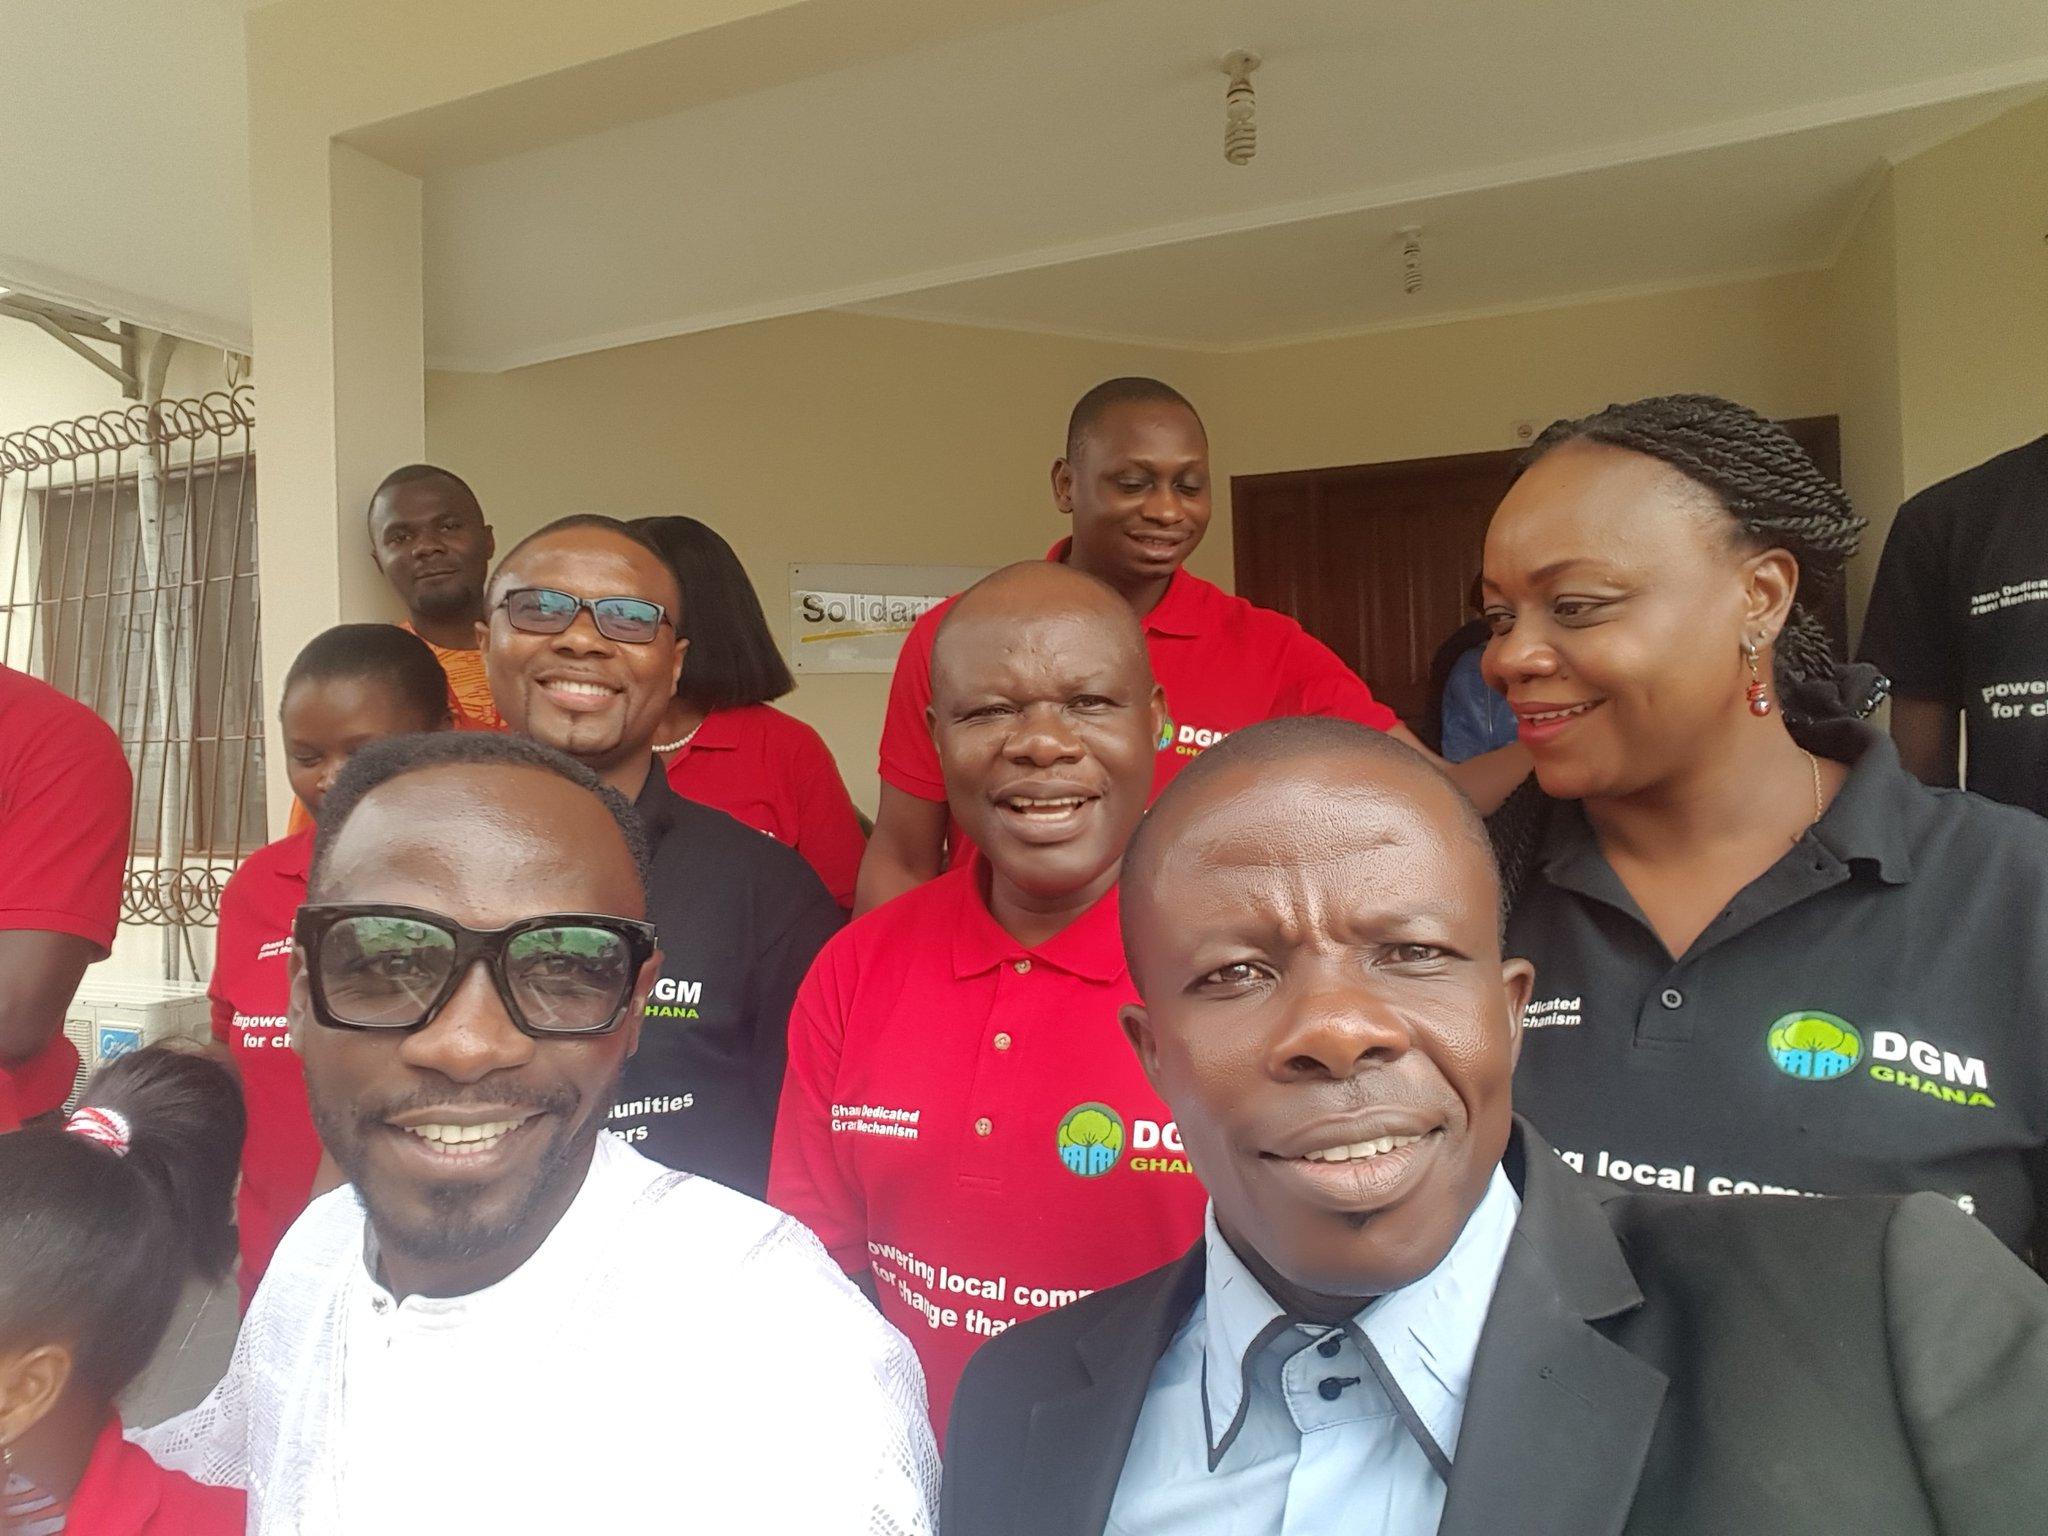 Okyeame Kwame (bottom left) posing with staff from Solidaridad West Africa; Credit: Hayford Duodu, DGM Ghana